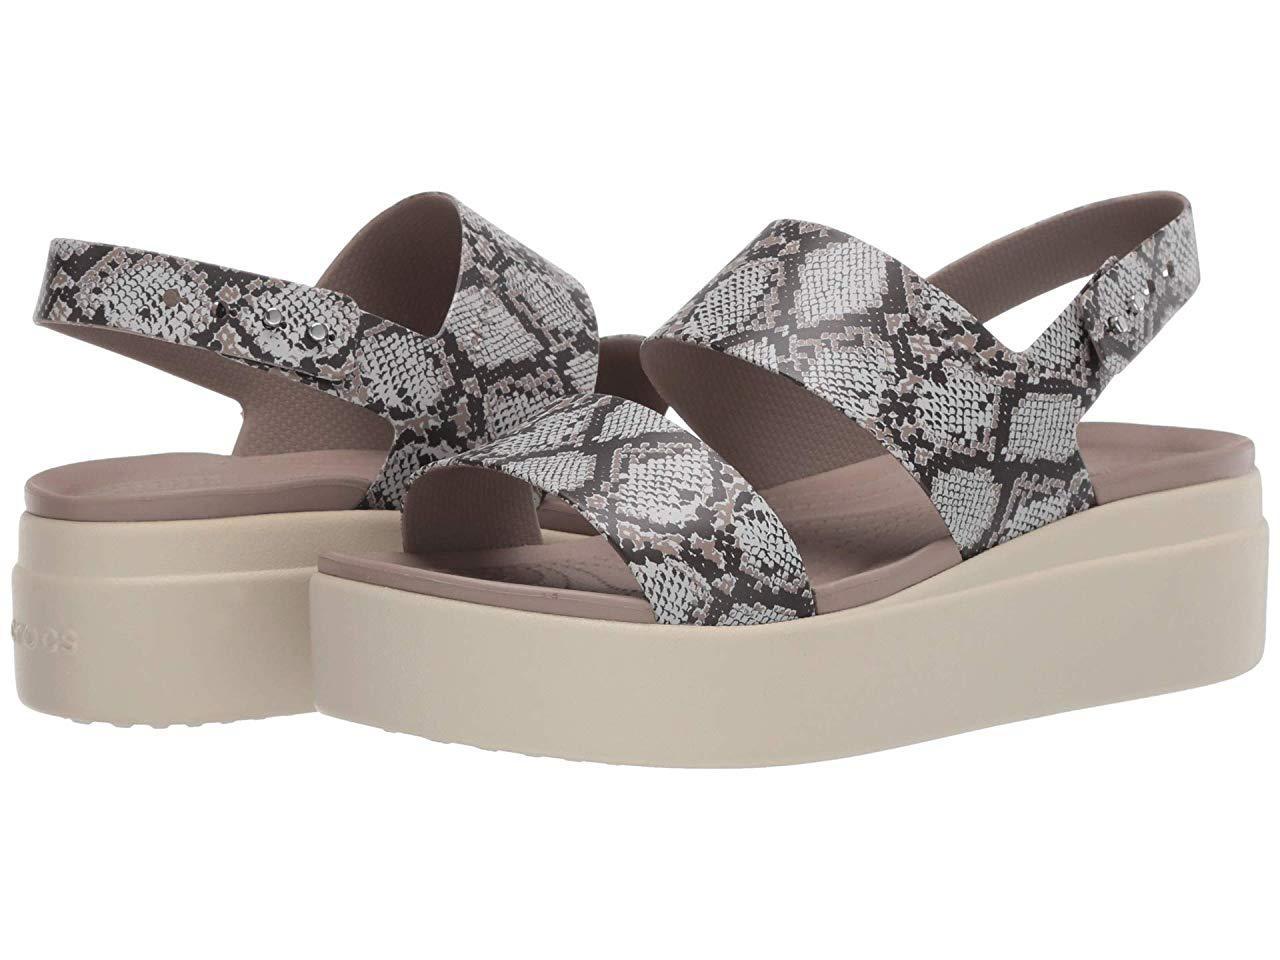 Туфли на каблуке Crocs Brooklyn Low Wedge Multi/Stucco